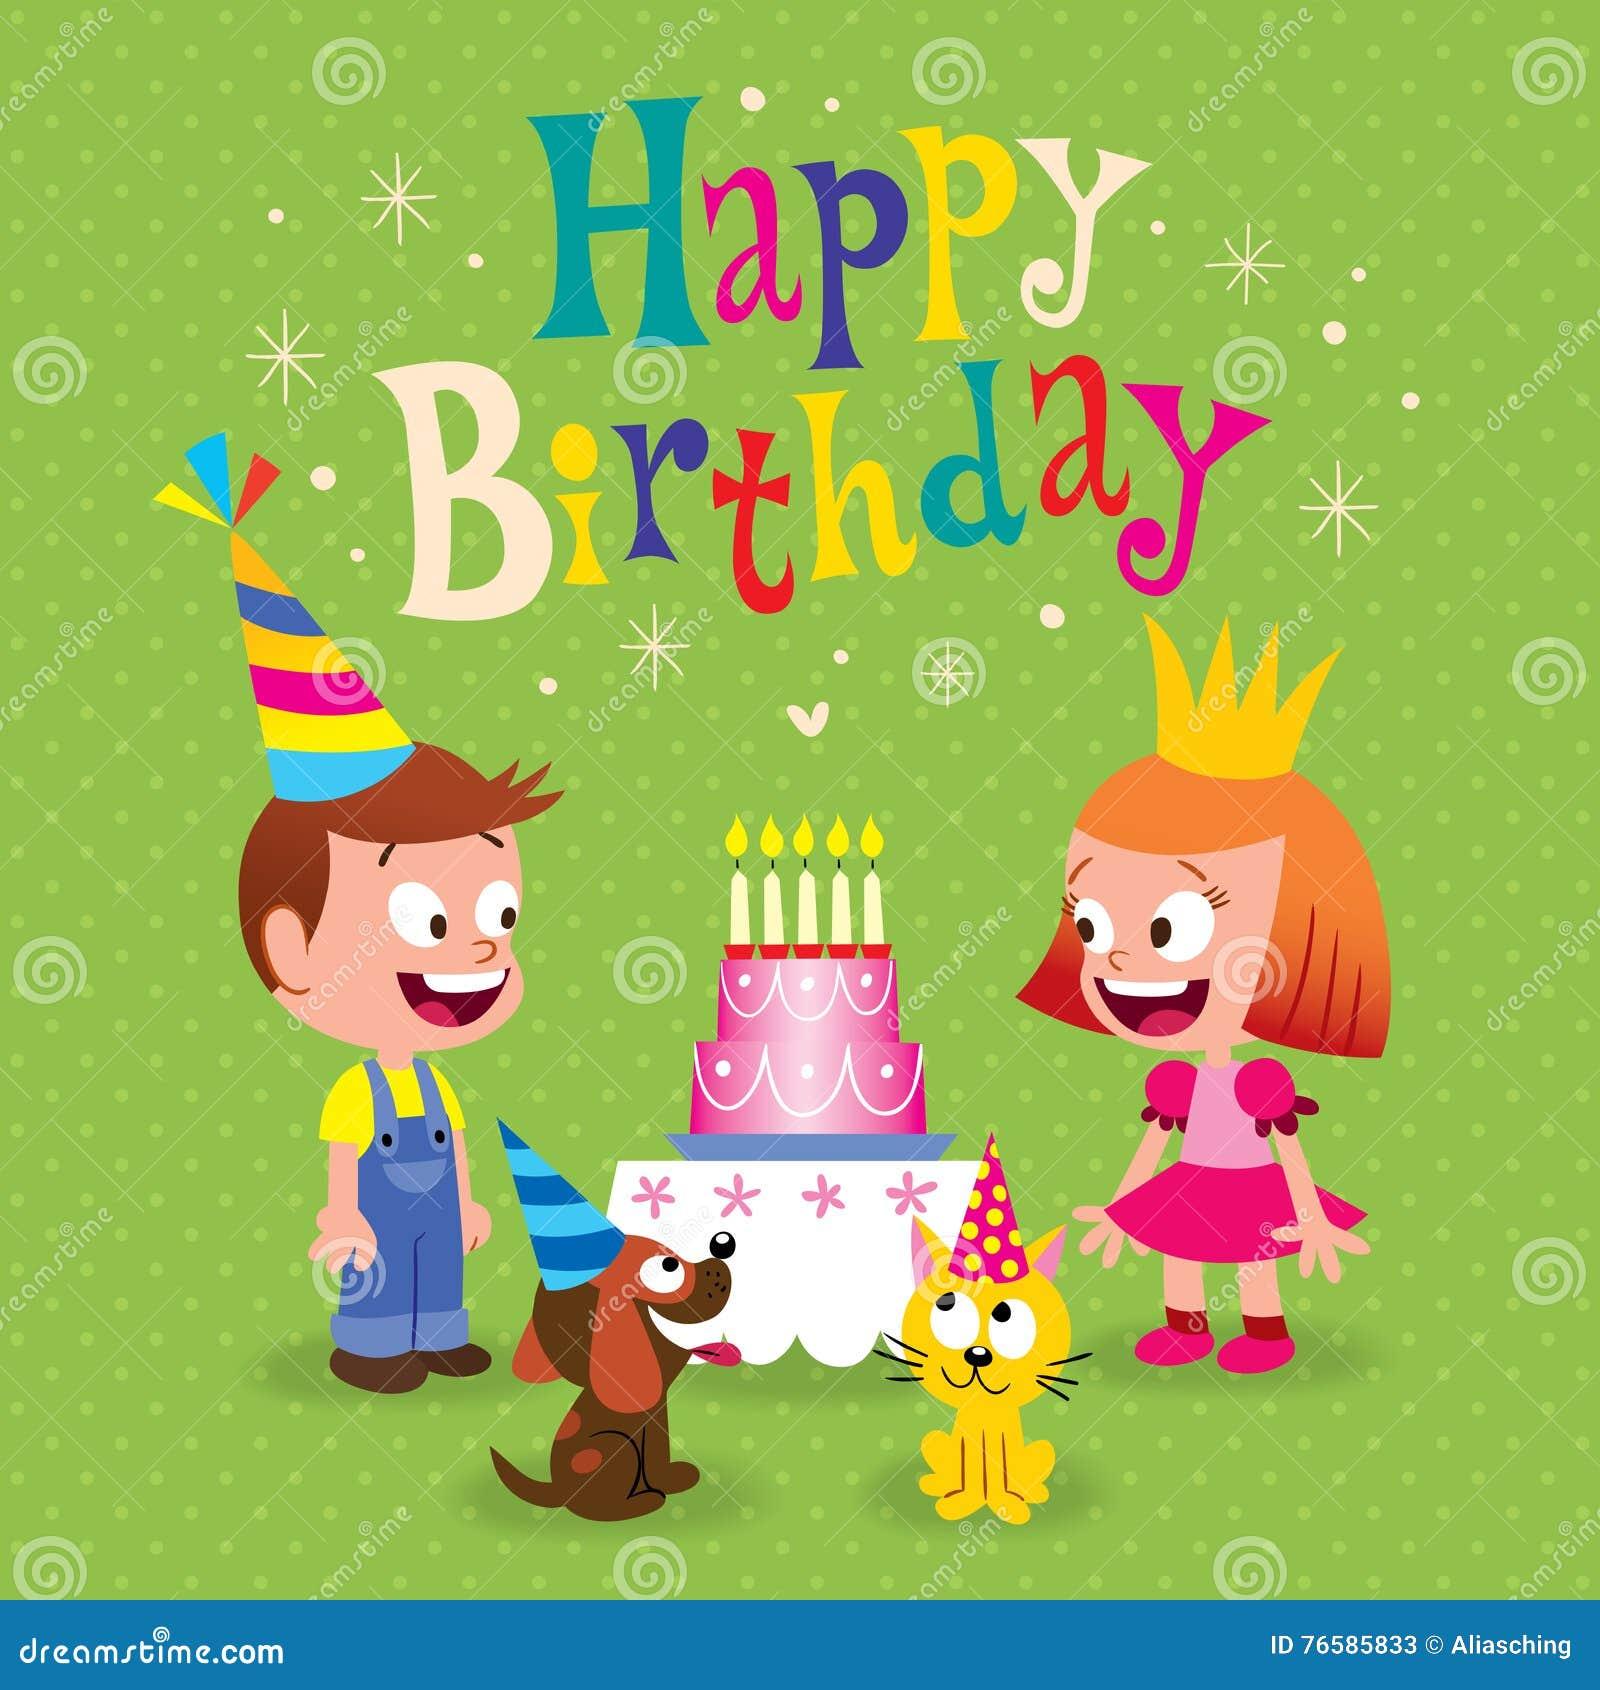 Happy Birthday Kids Greeting Card Stock Vector Illustration Of